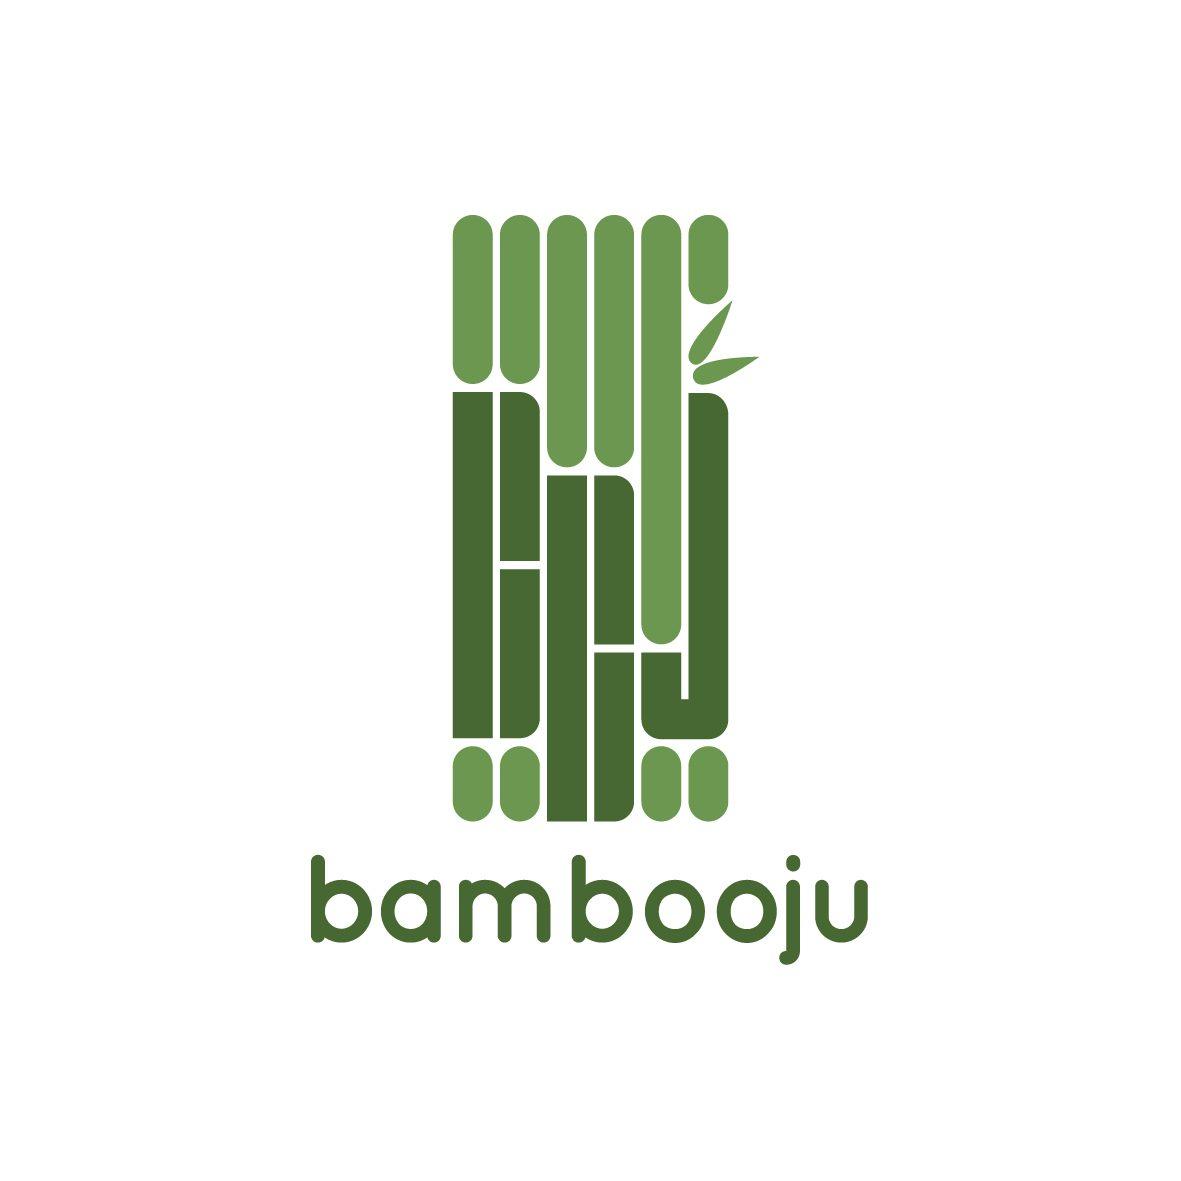 Bambooju